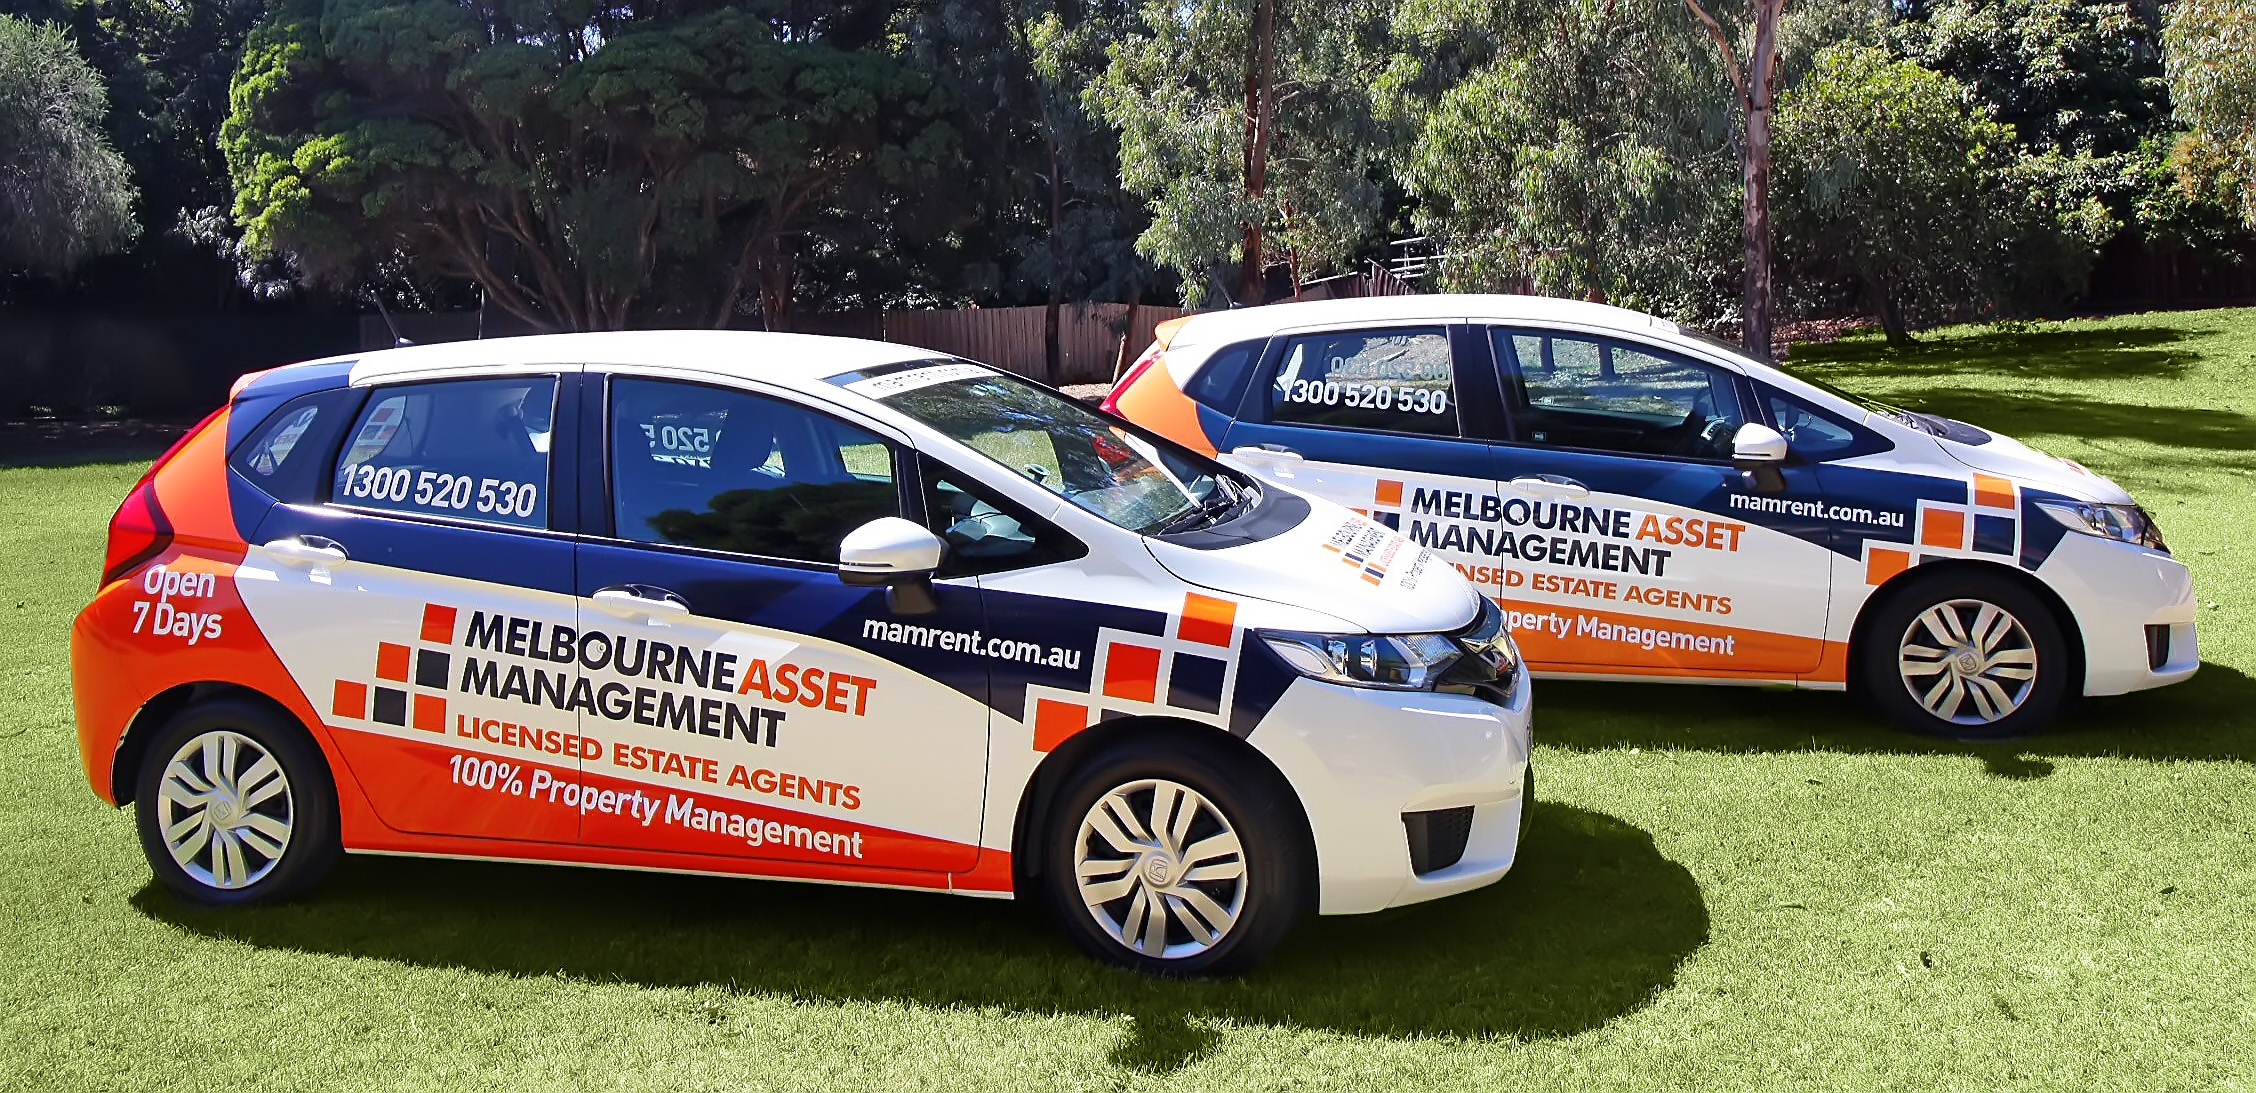 Melbourne Asset Management